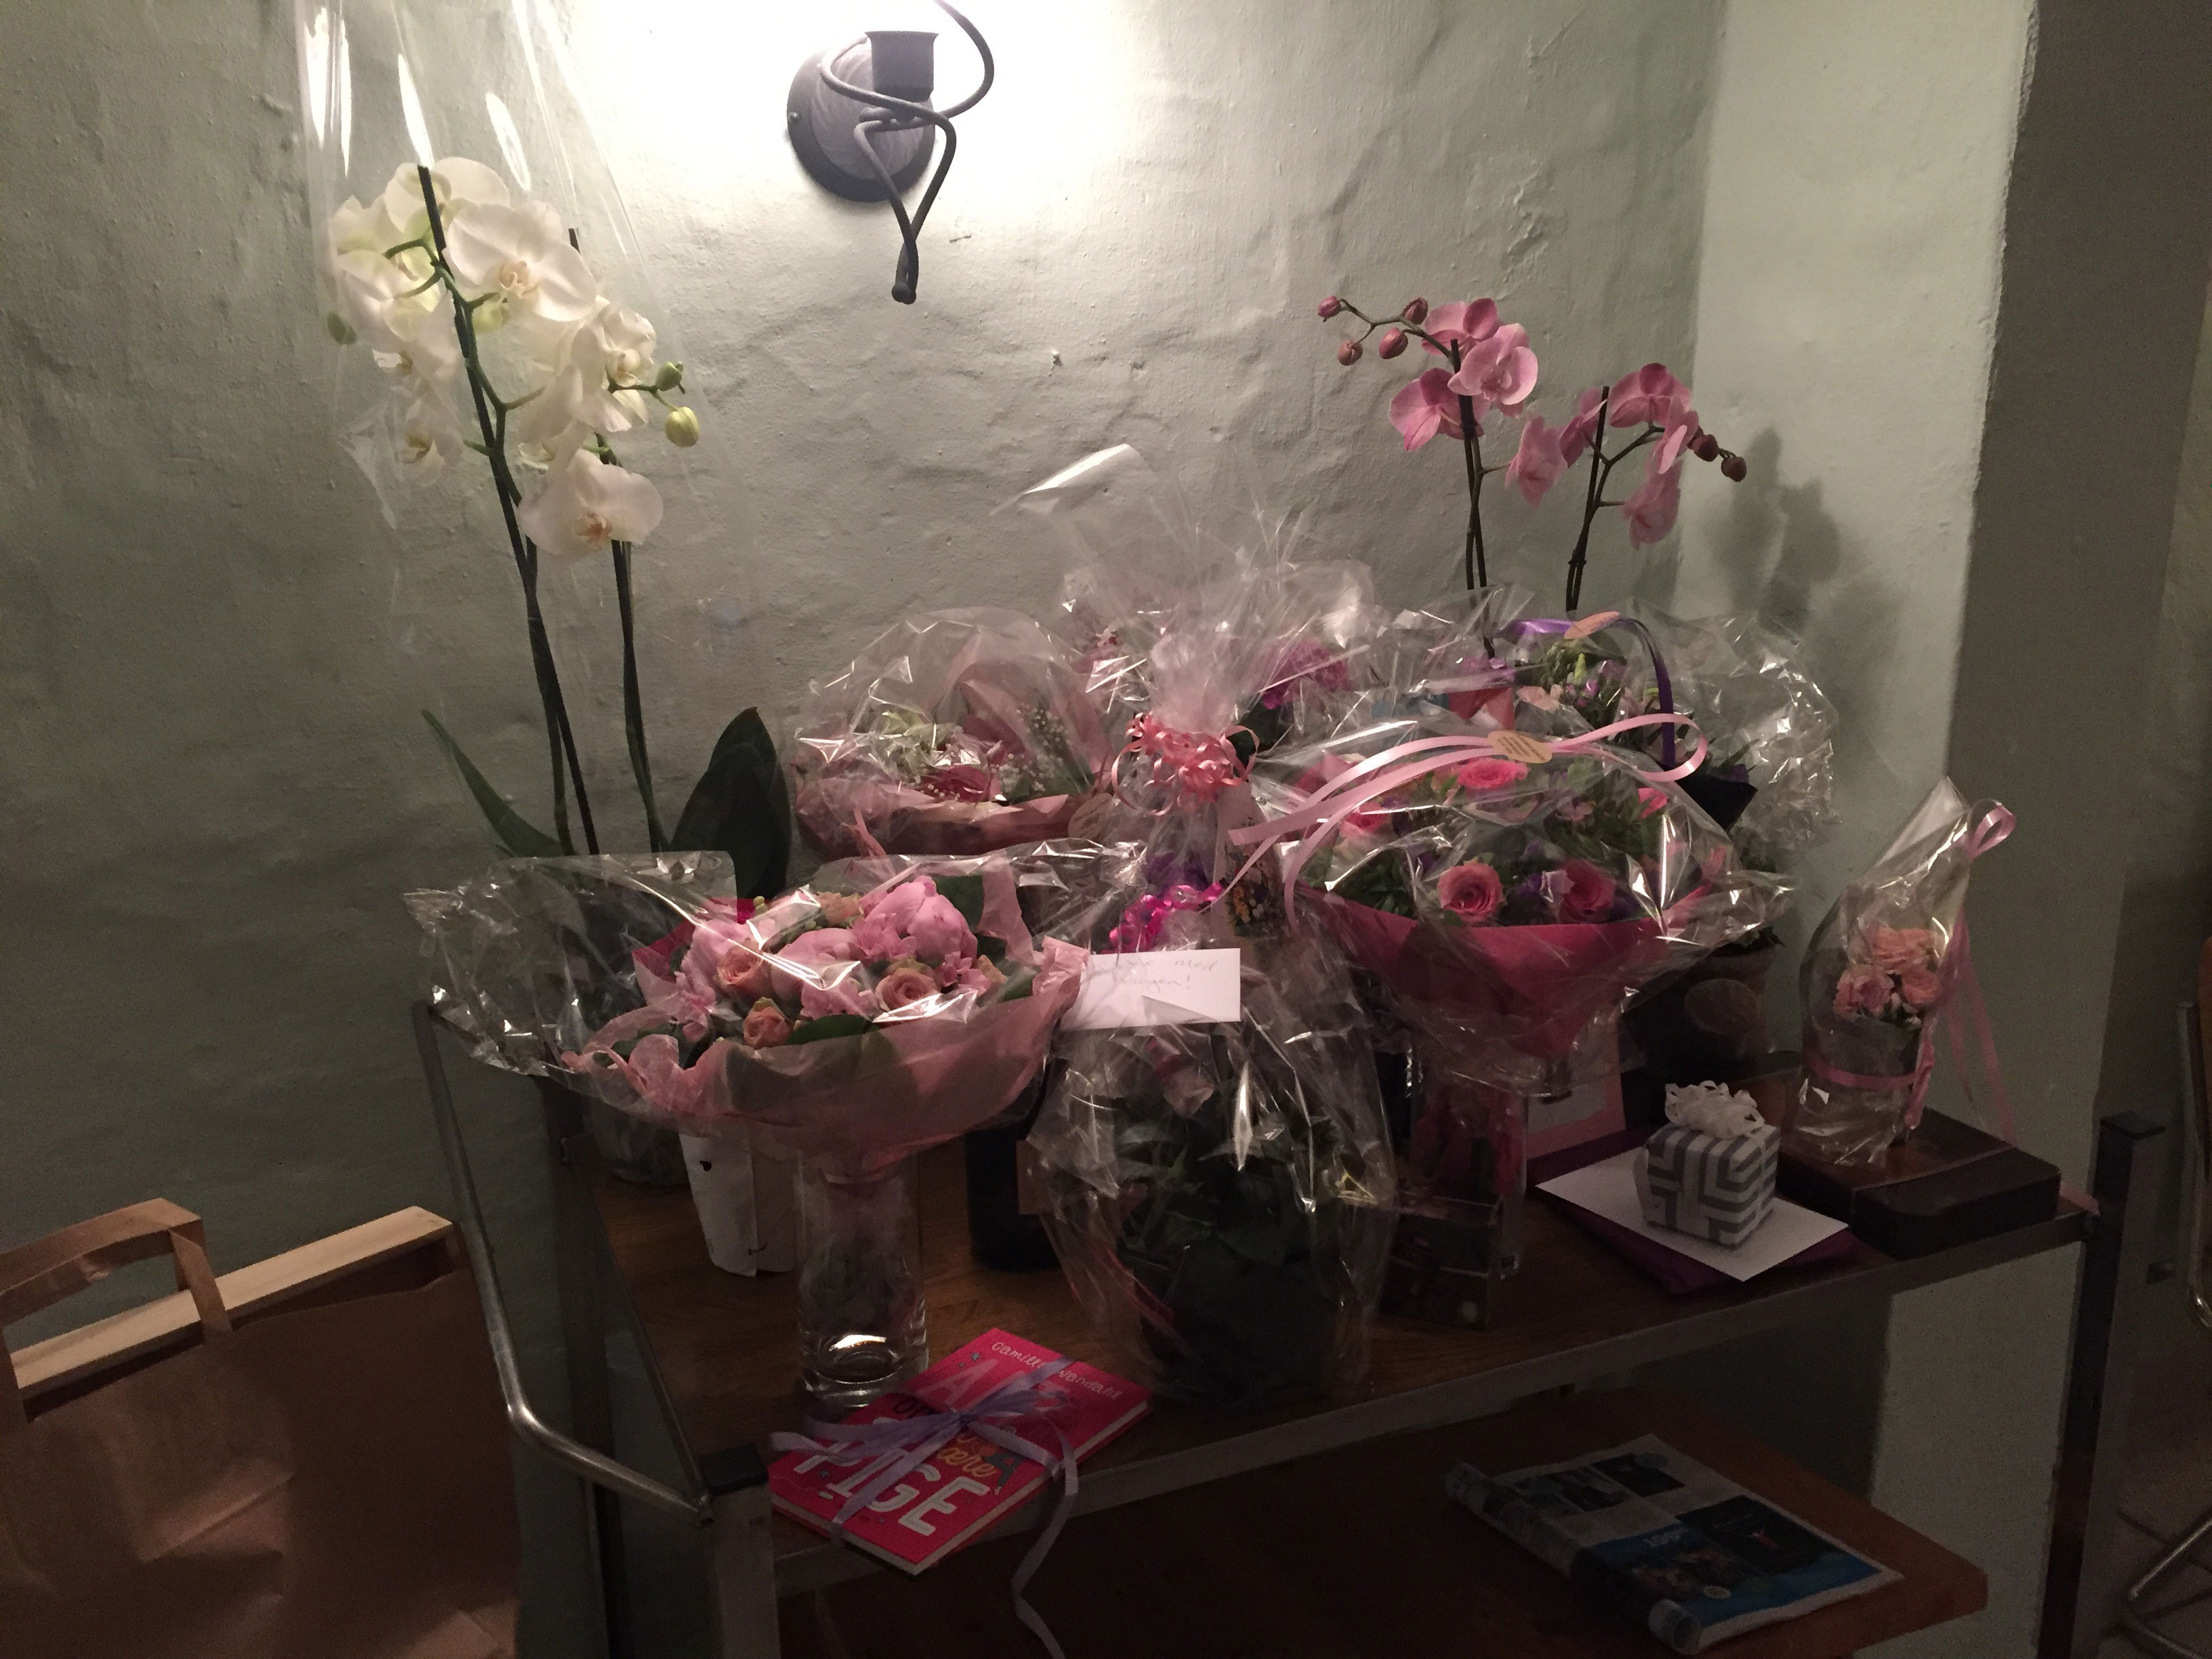 Blomster og gaver til receptionen